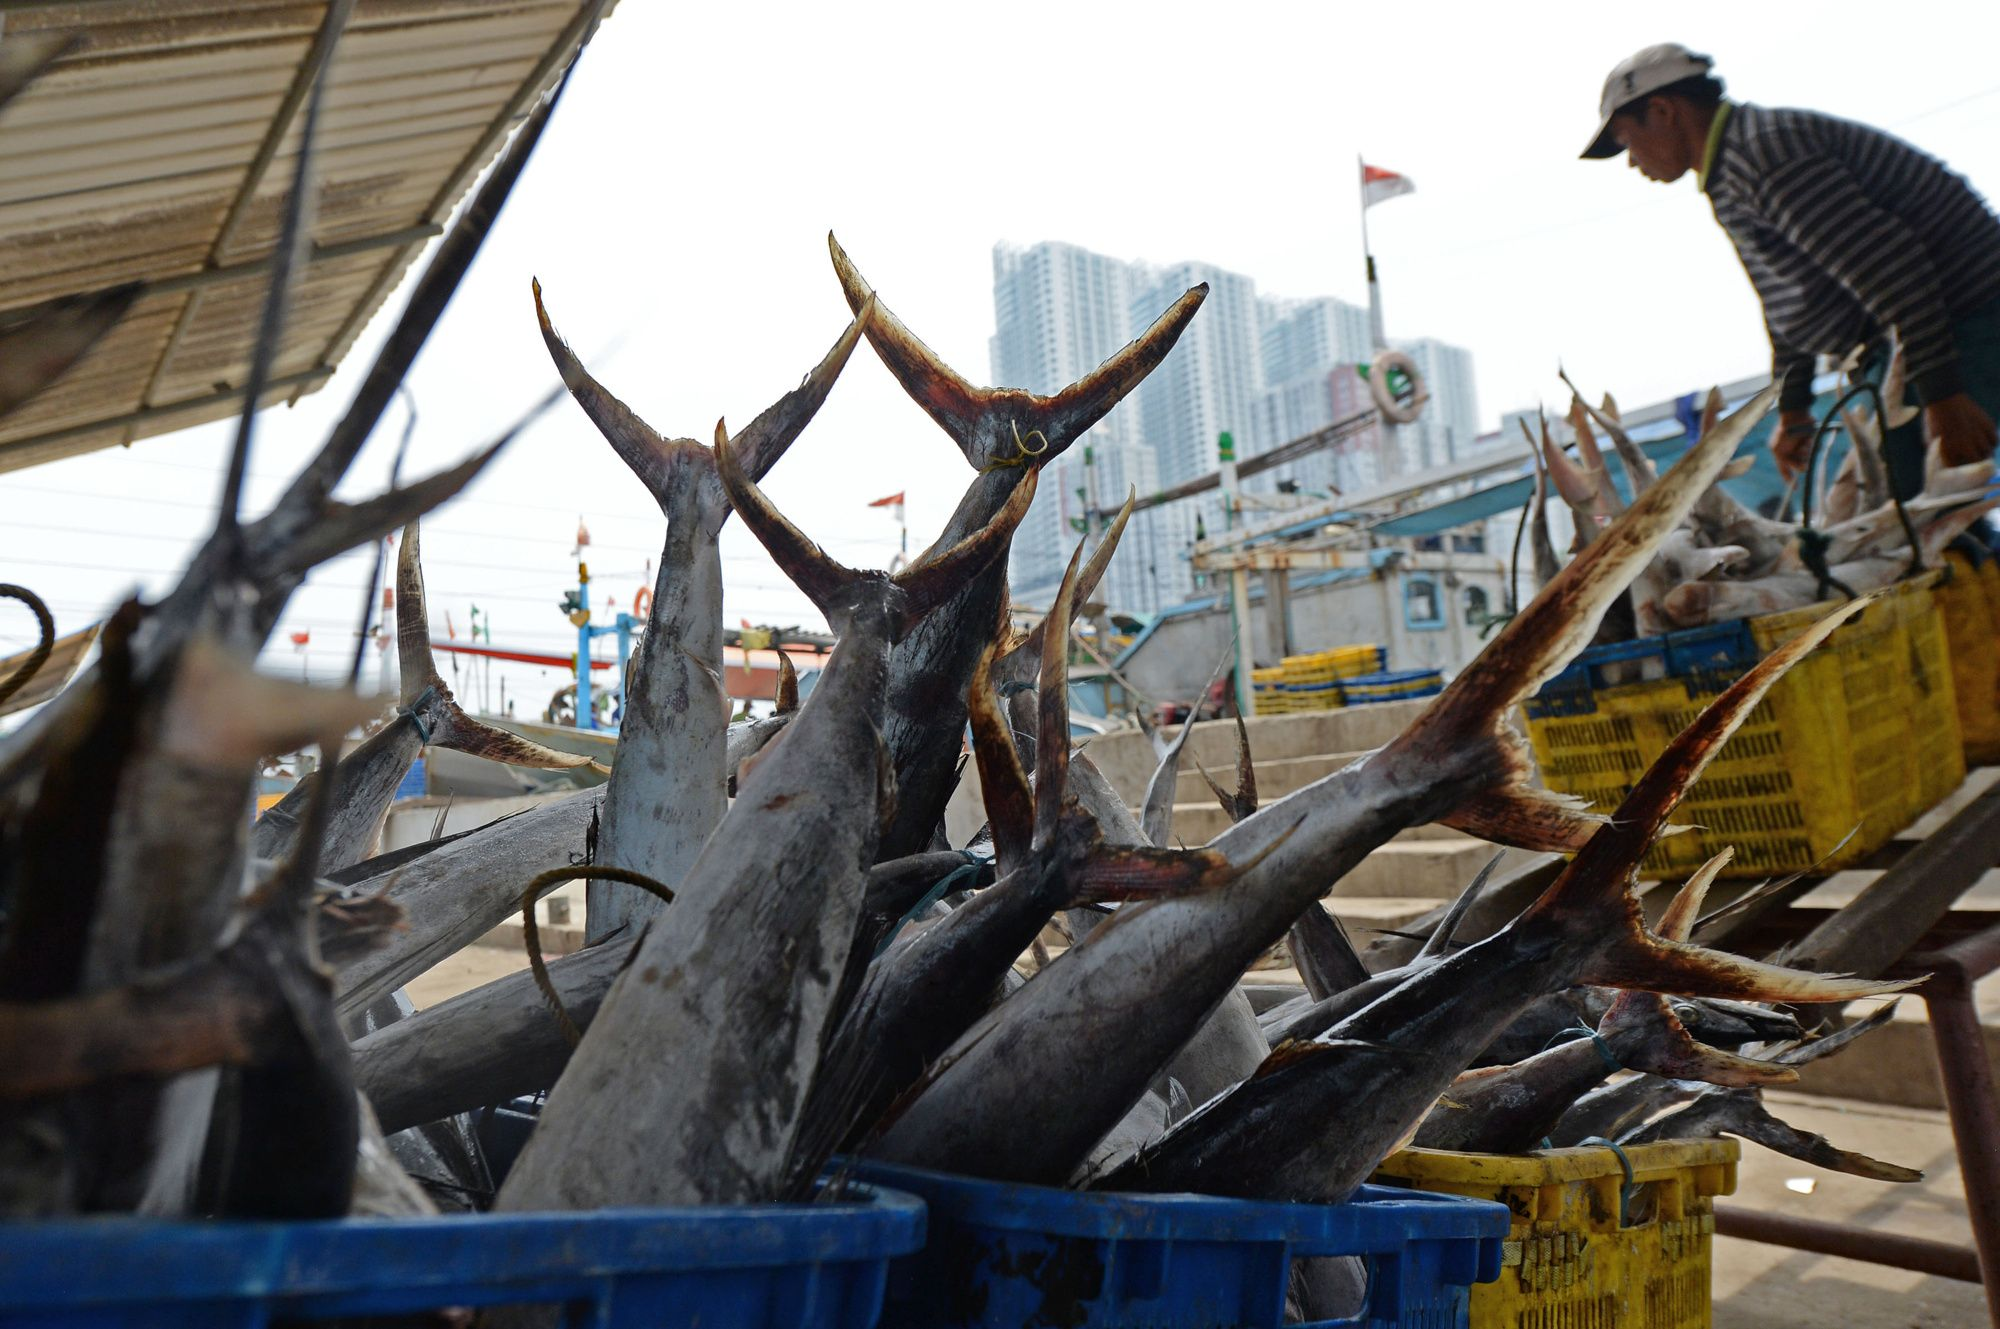 Indonesia Steps Up Sea Patrols to Monitor China Fishing Boats